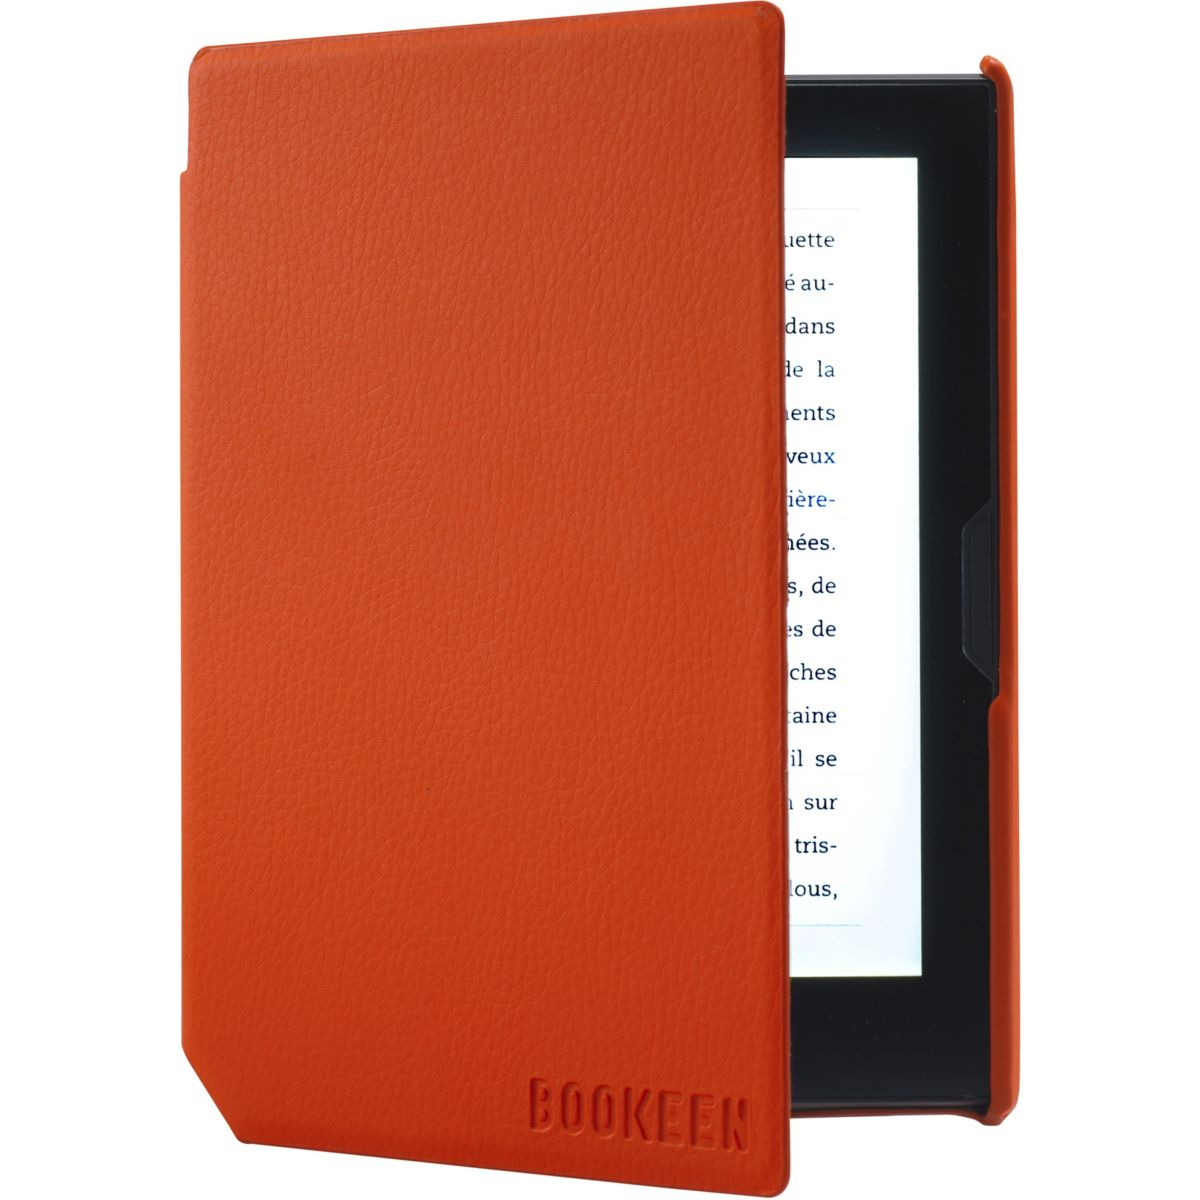 e-book BOOKEEN Cover Cybook Muse orange (photo)